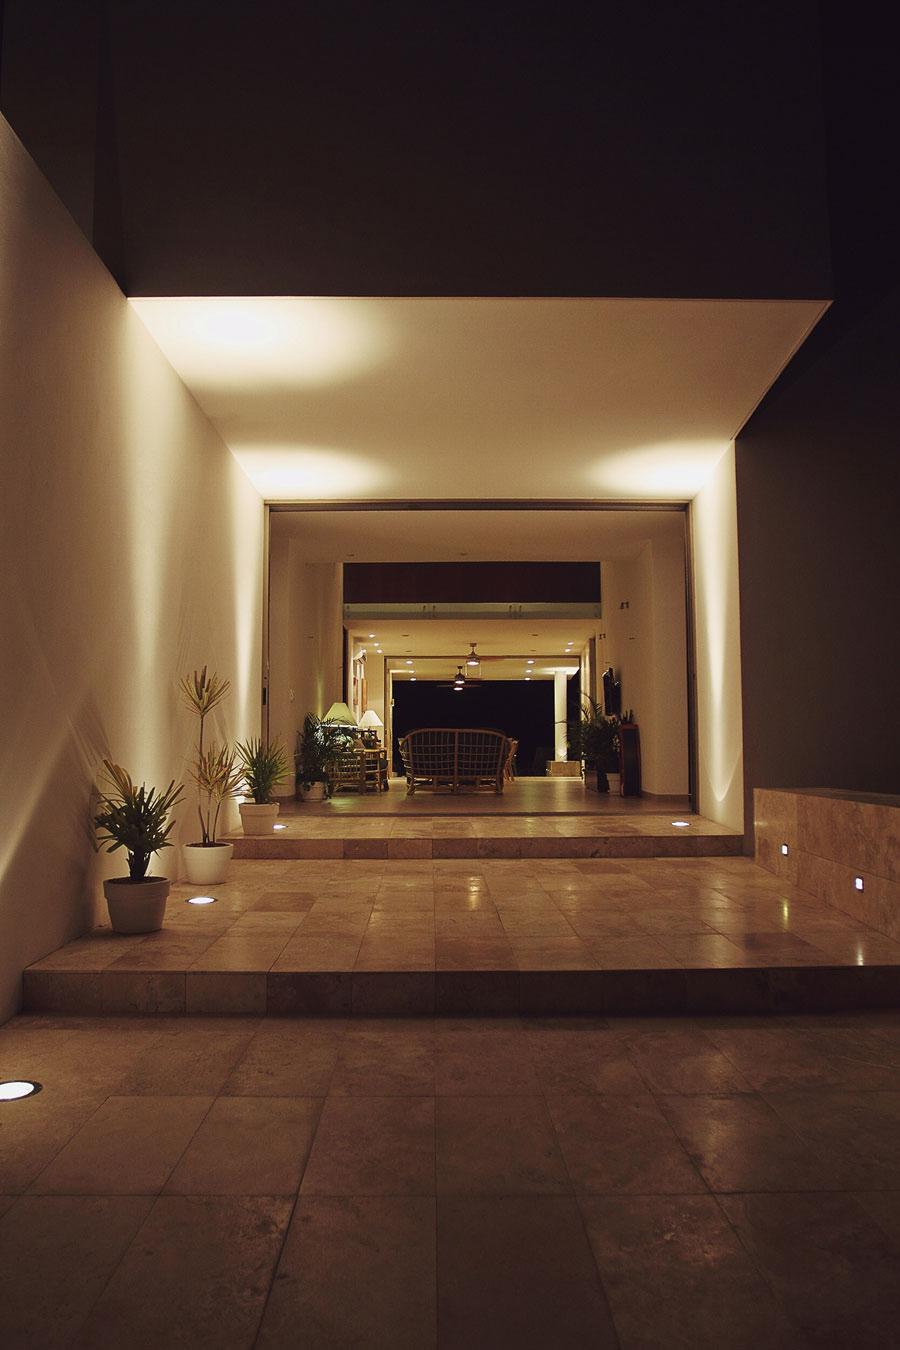 Steps, Lighting, Tuunich Kanab in San Bruno, Mexico by Seijo Peon Arquitectos